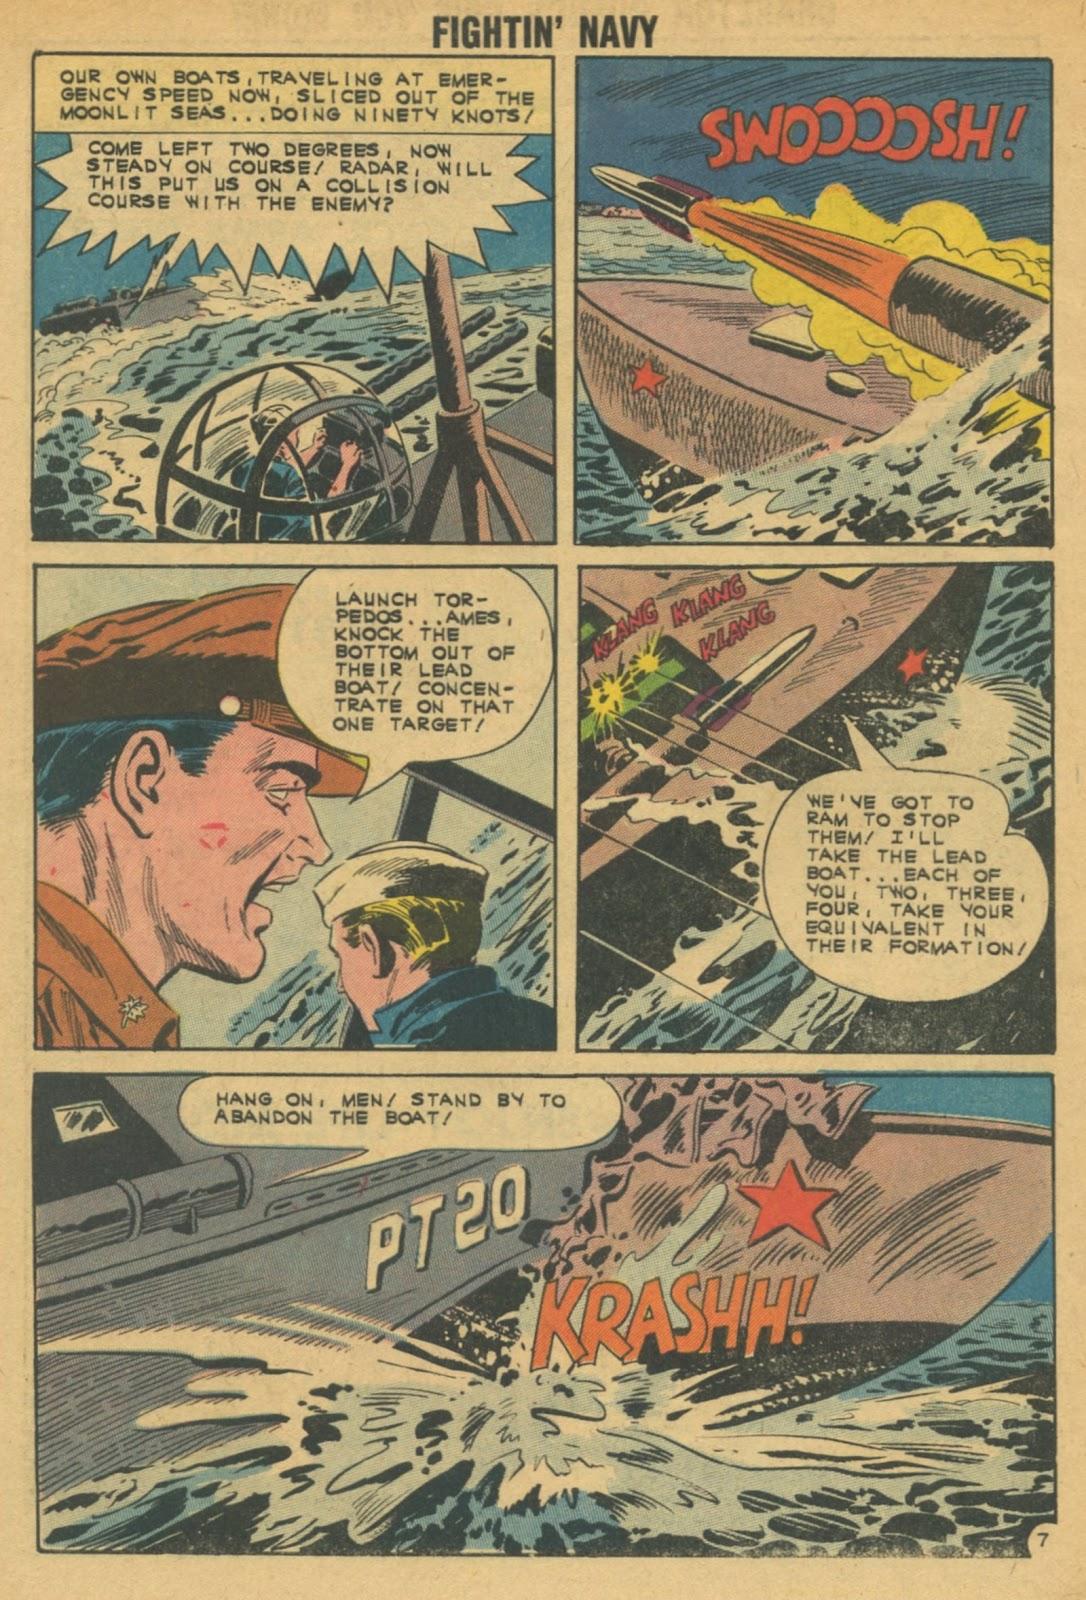 Read online Fightin' Navy comic -  Issue #103 - 32